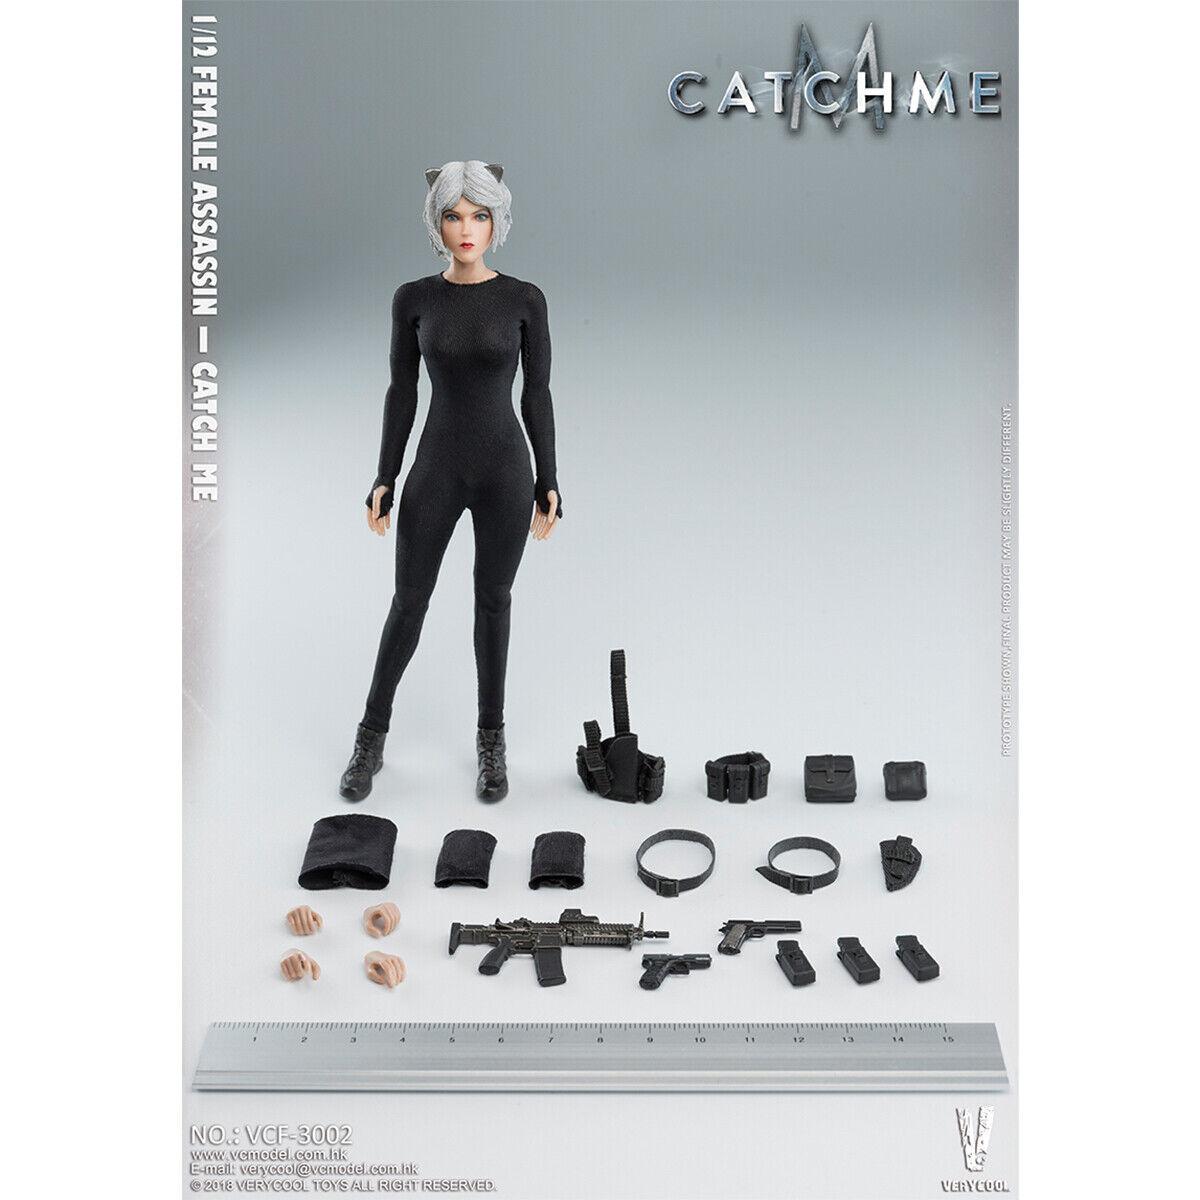 VERYCOOL VCF-3002 1 12 Palm Treasure serie Female Assassin Catch Me  Figure New